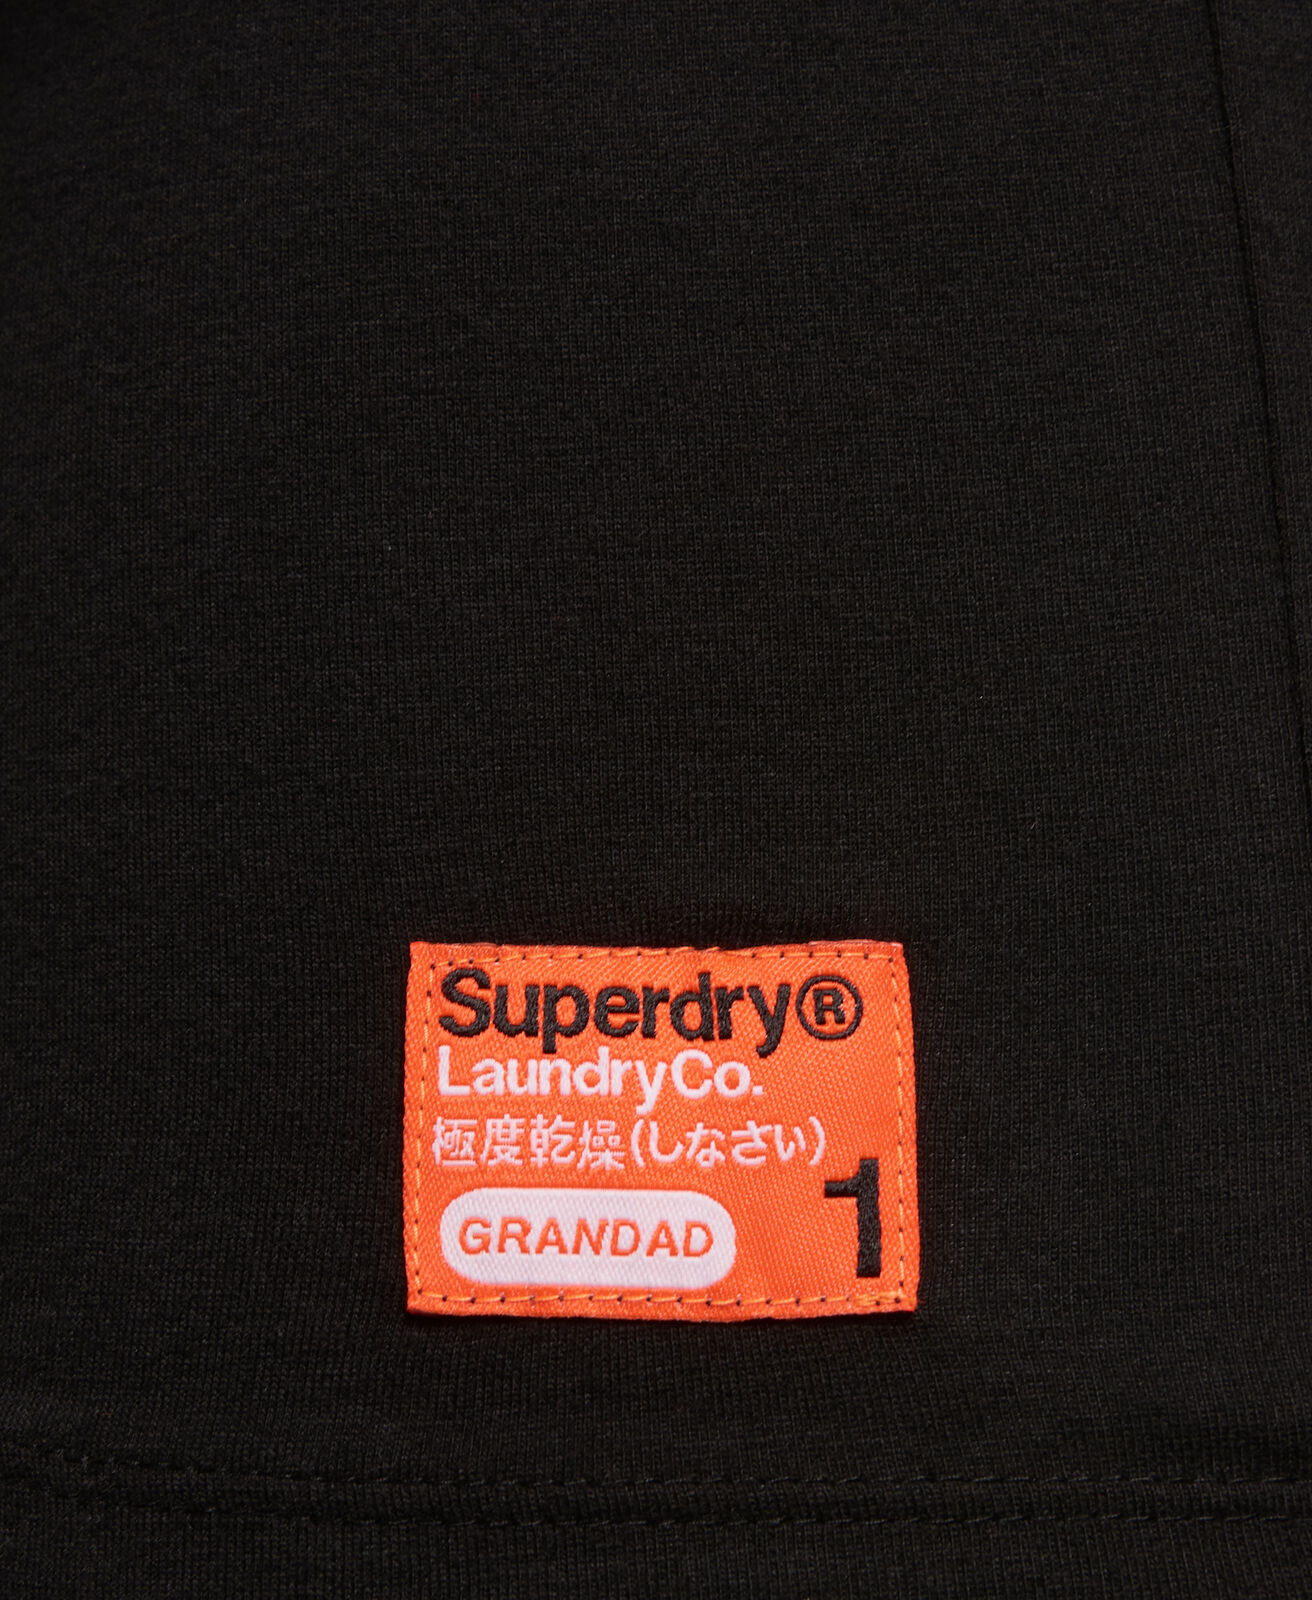 Mens-Superdry-Laundry-Organic-Cotton-Grandad-Top-Laundry-Black thumbnail 18